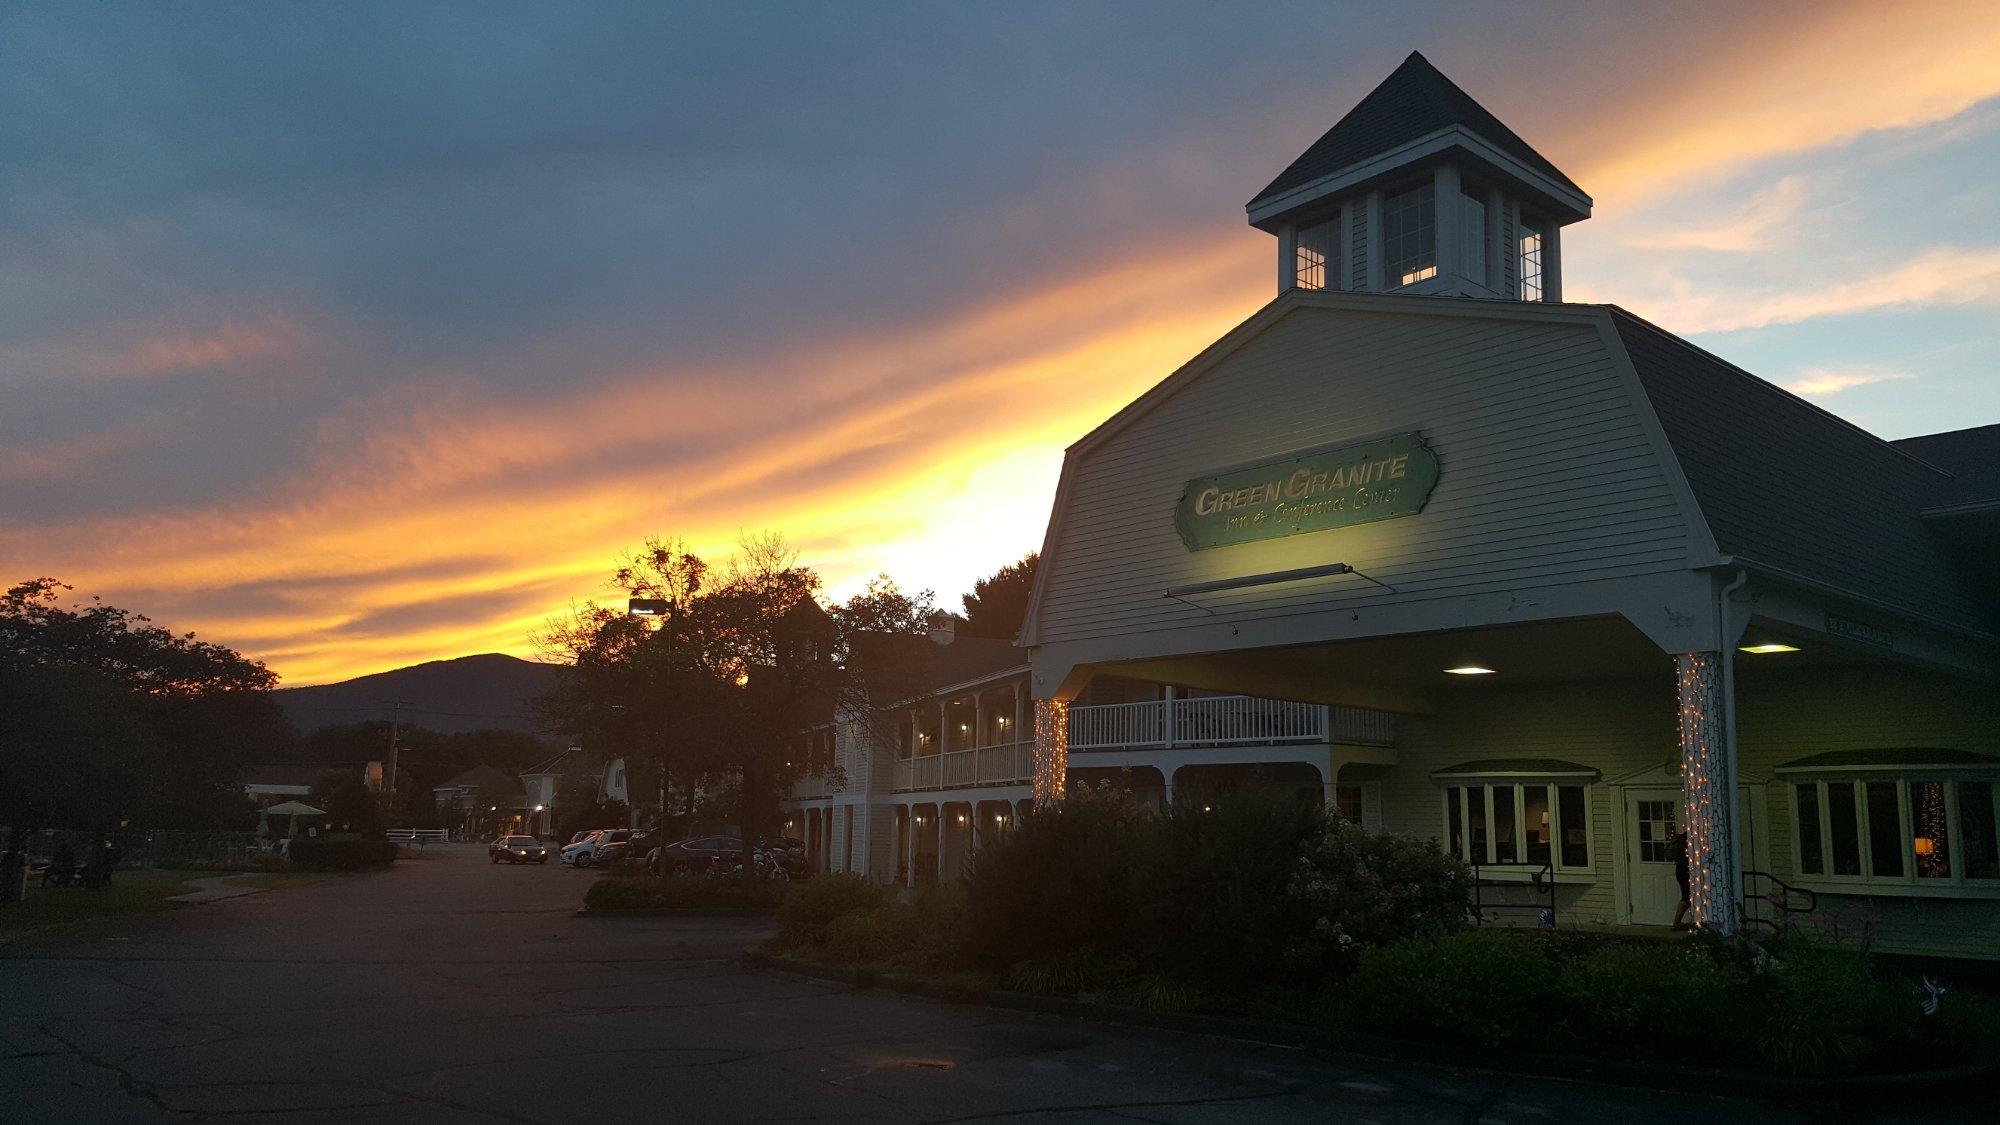 Green Granite Inn u0026 Conference Center - UPDATED 2017 Hotel Reviews u0026 Price  Comparison (North Conway, NH) - TripAdvisor